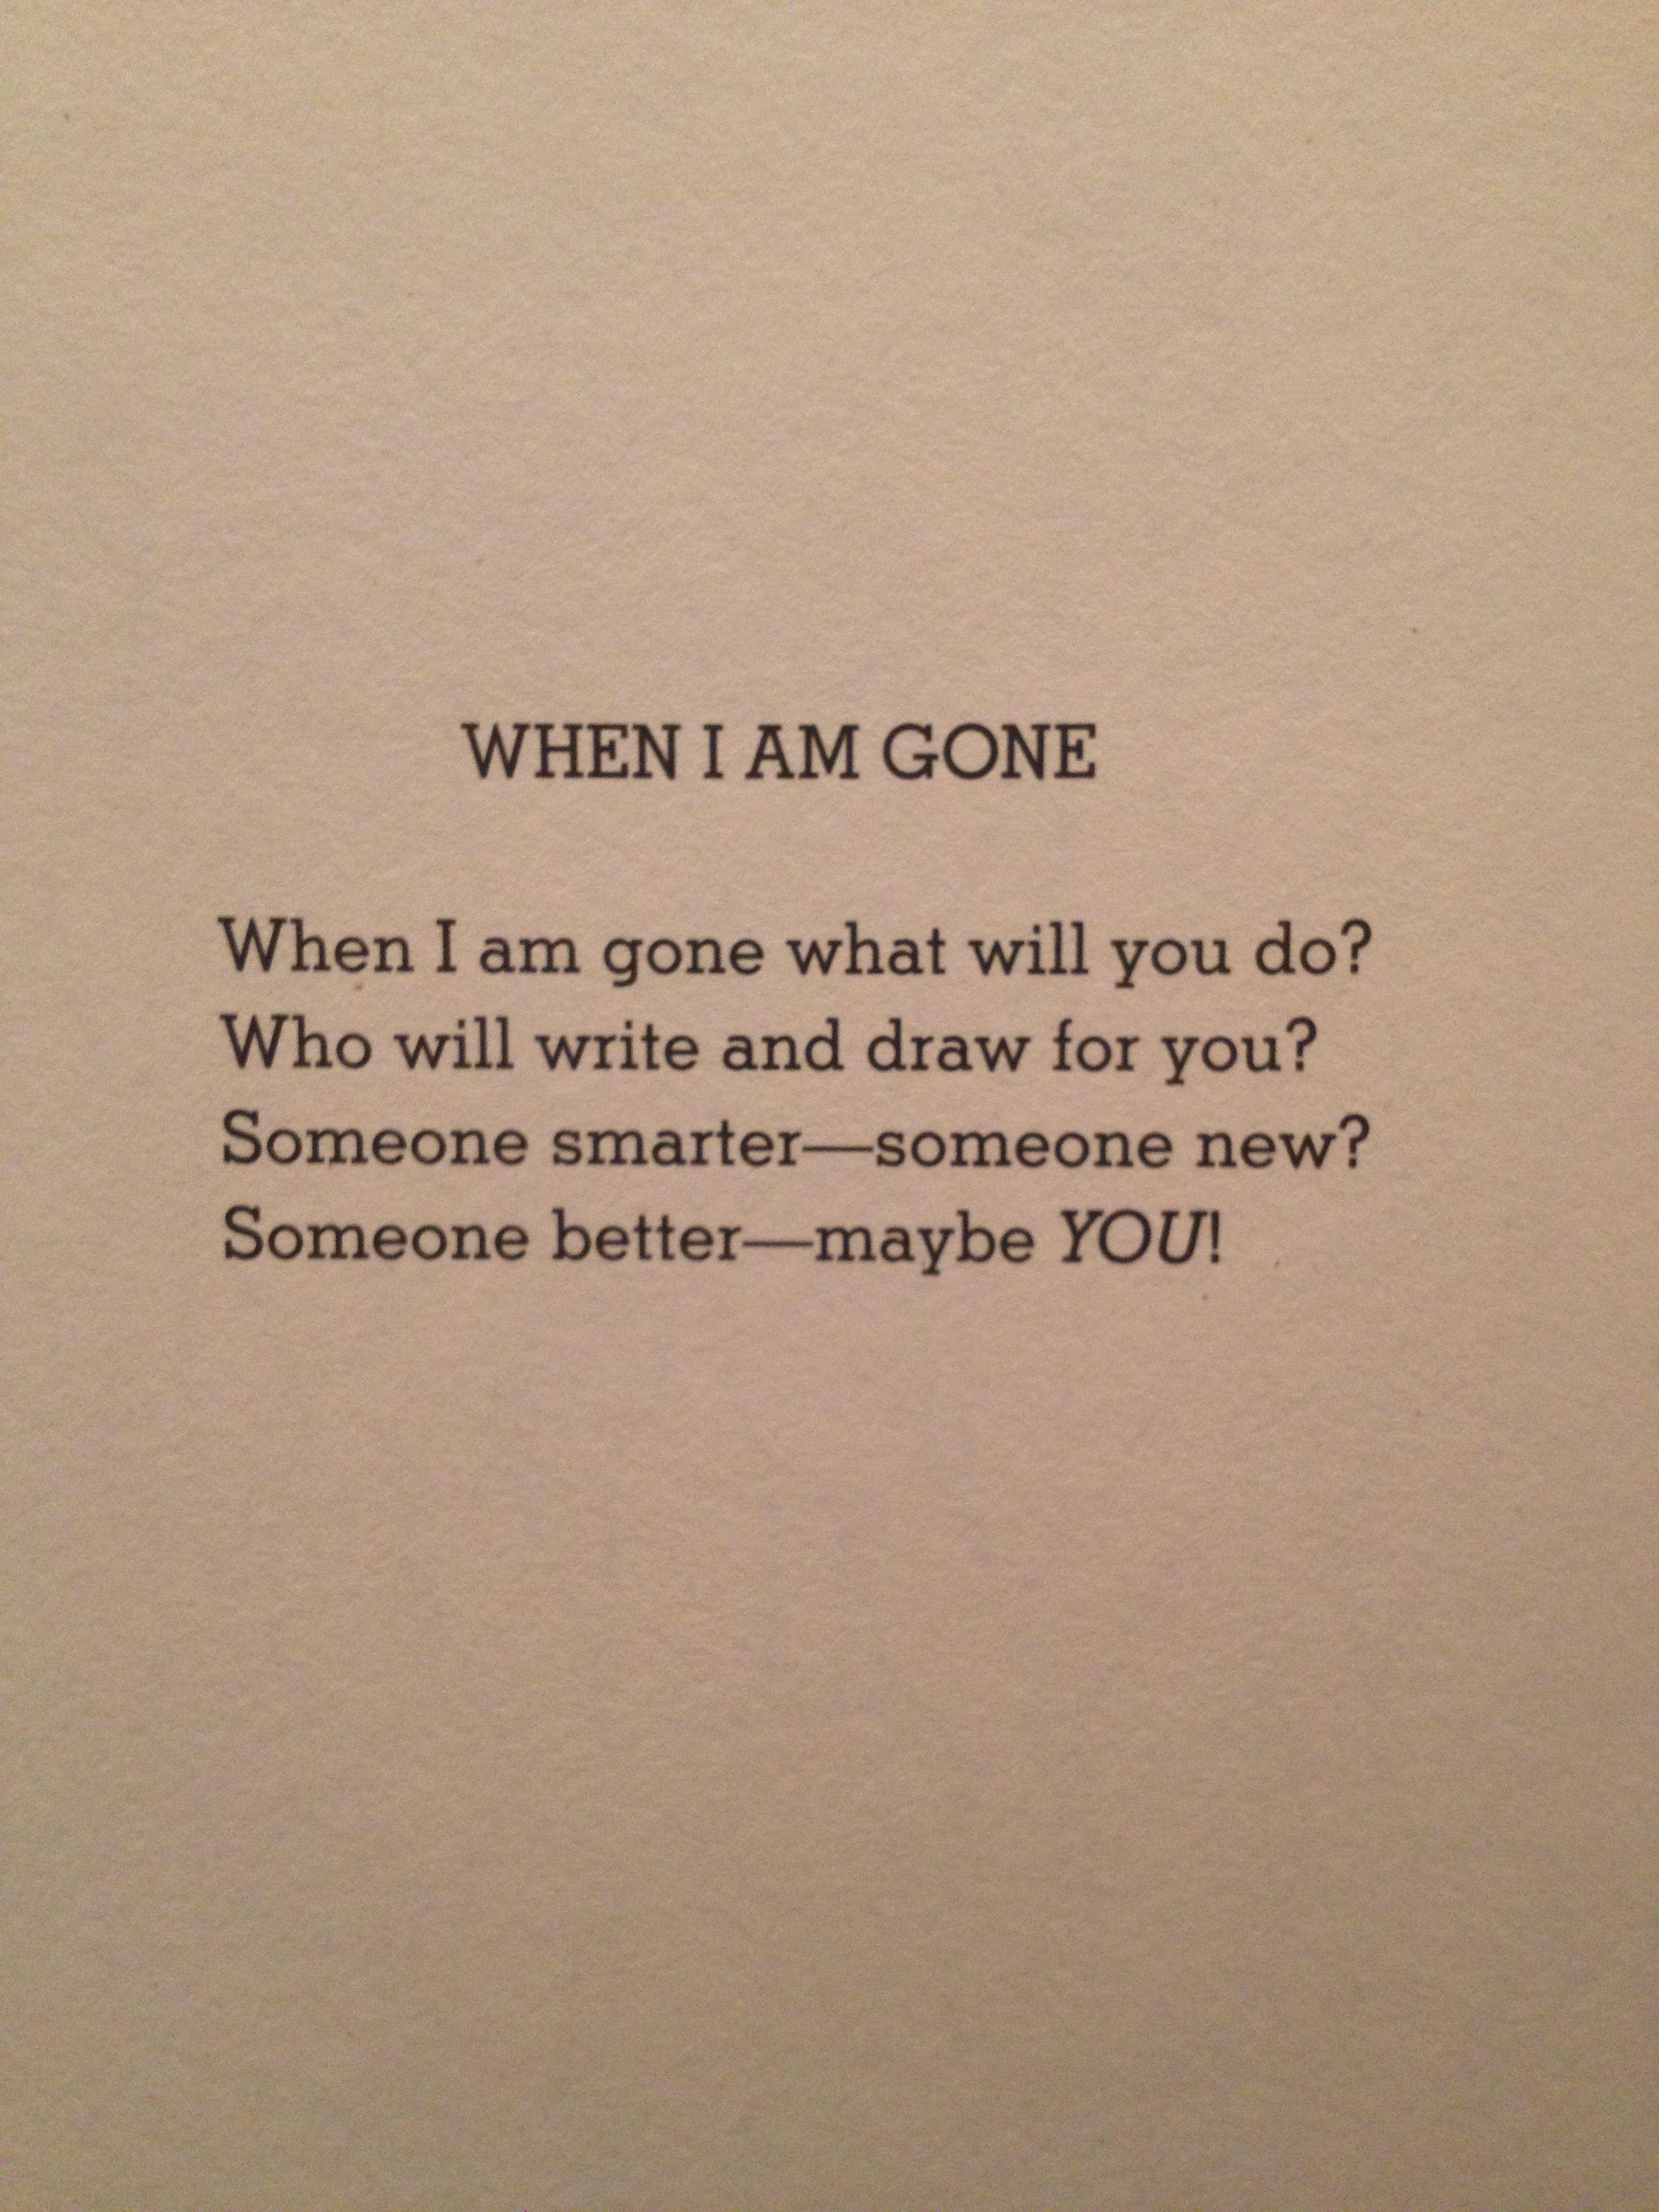 When I Am Gone My Favorite Shel Silverstein Poem Inspiring